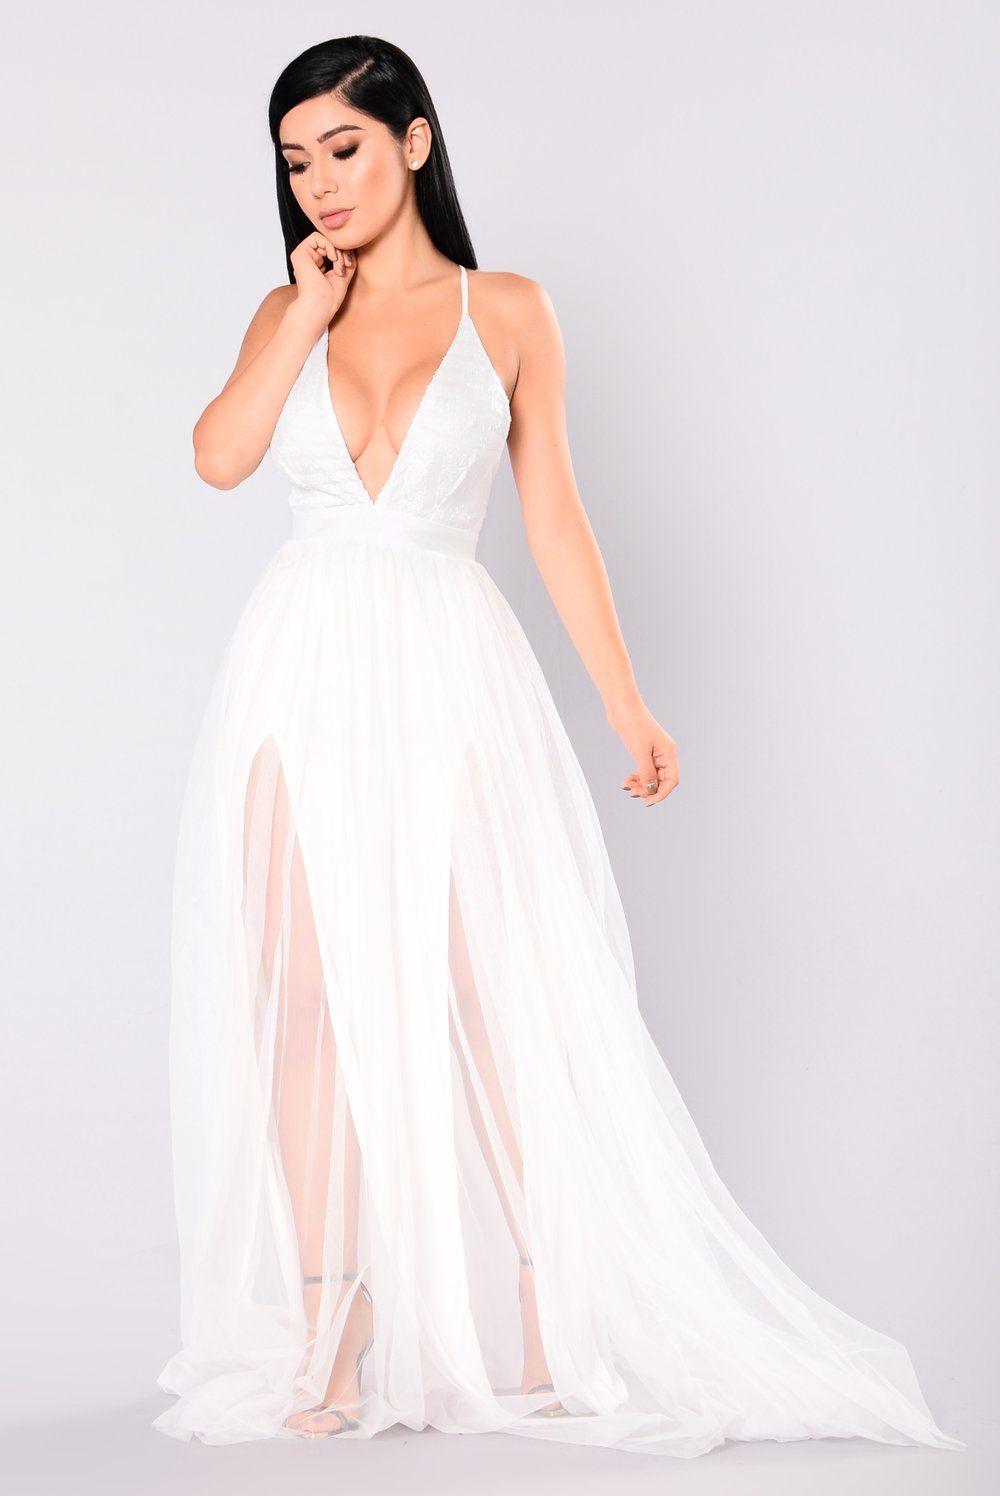 Majestic Sequin Dress White Dresses Fashion Nova Dress White Dress [ 1496 x 1000 Pixel ]